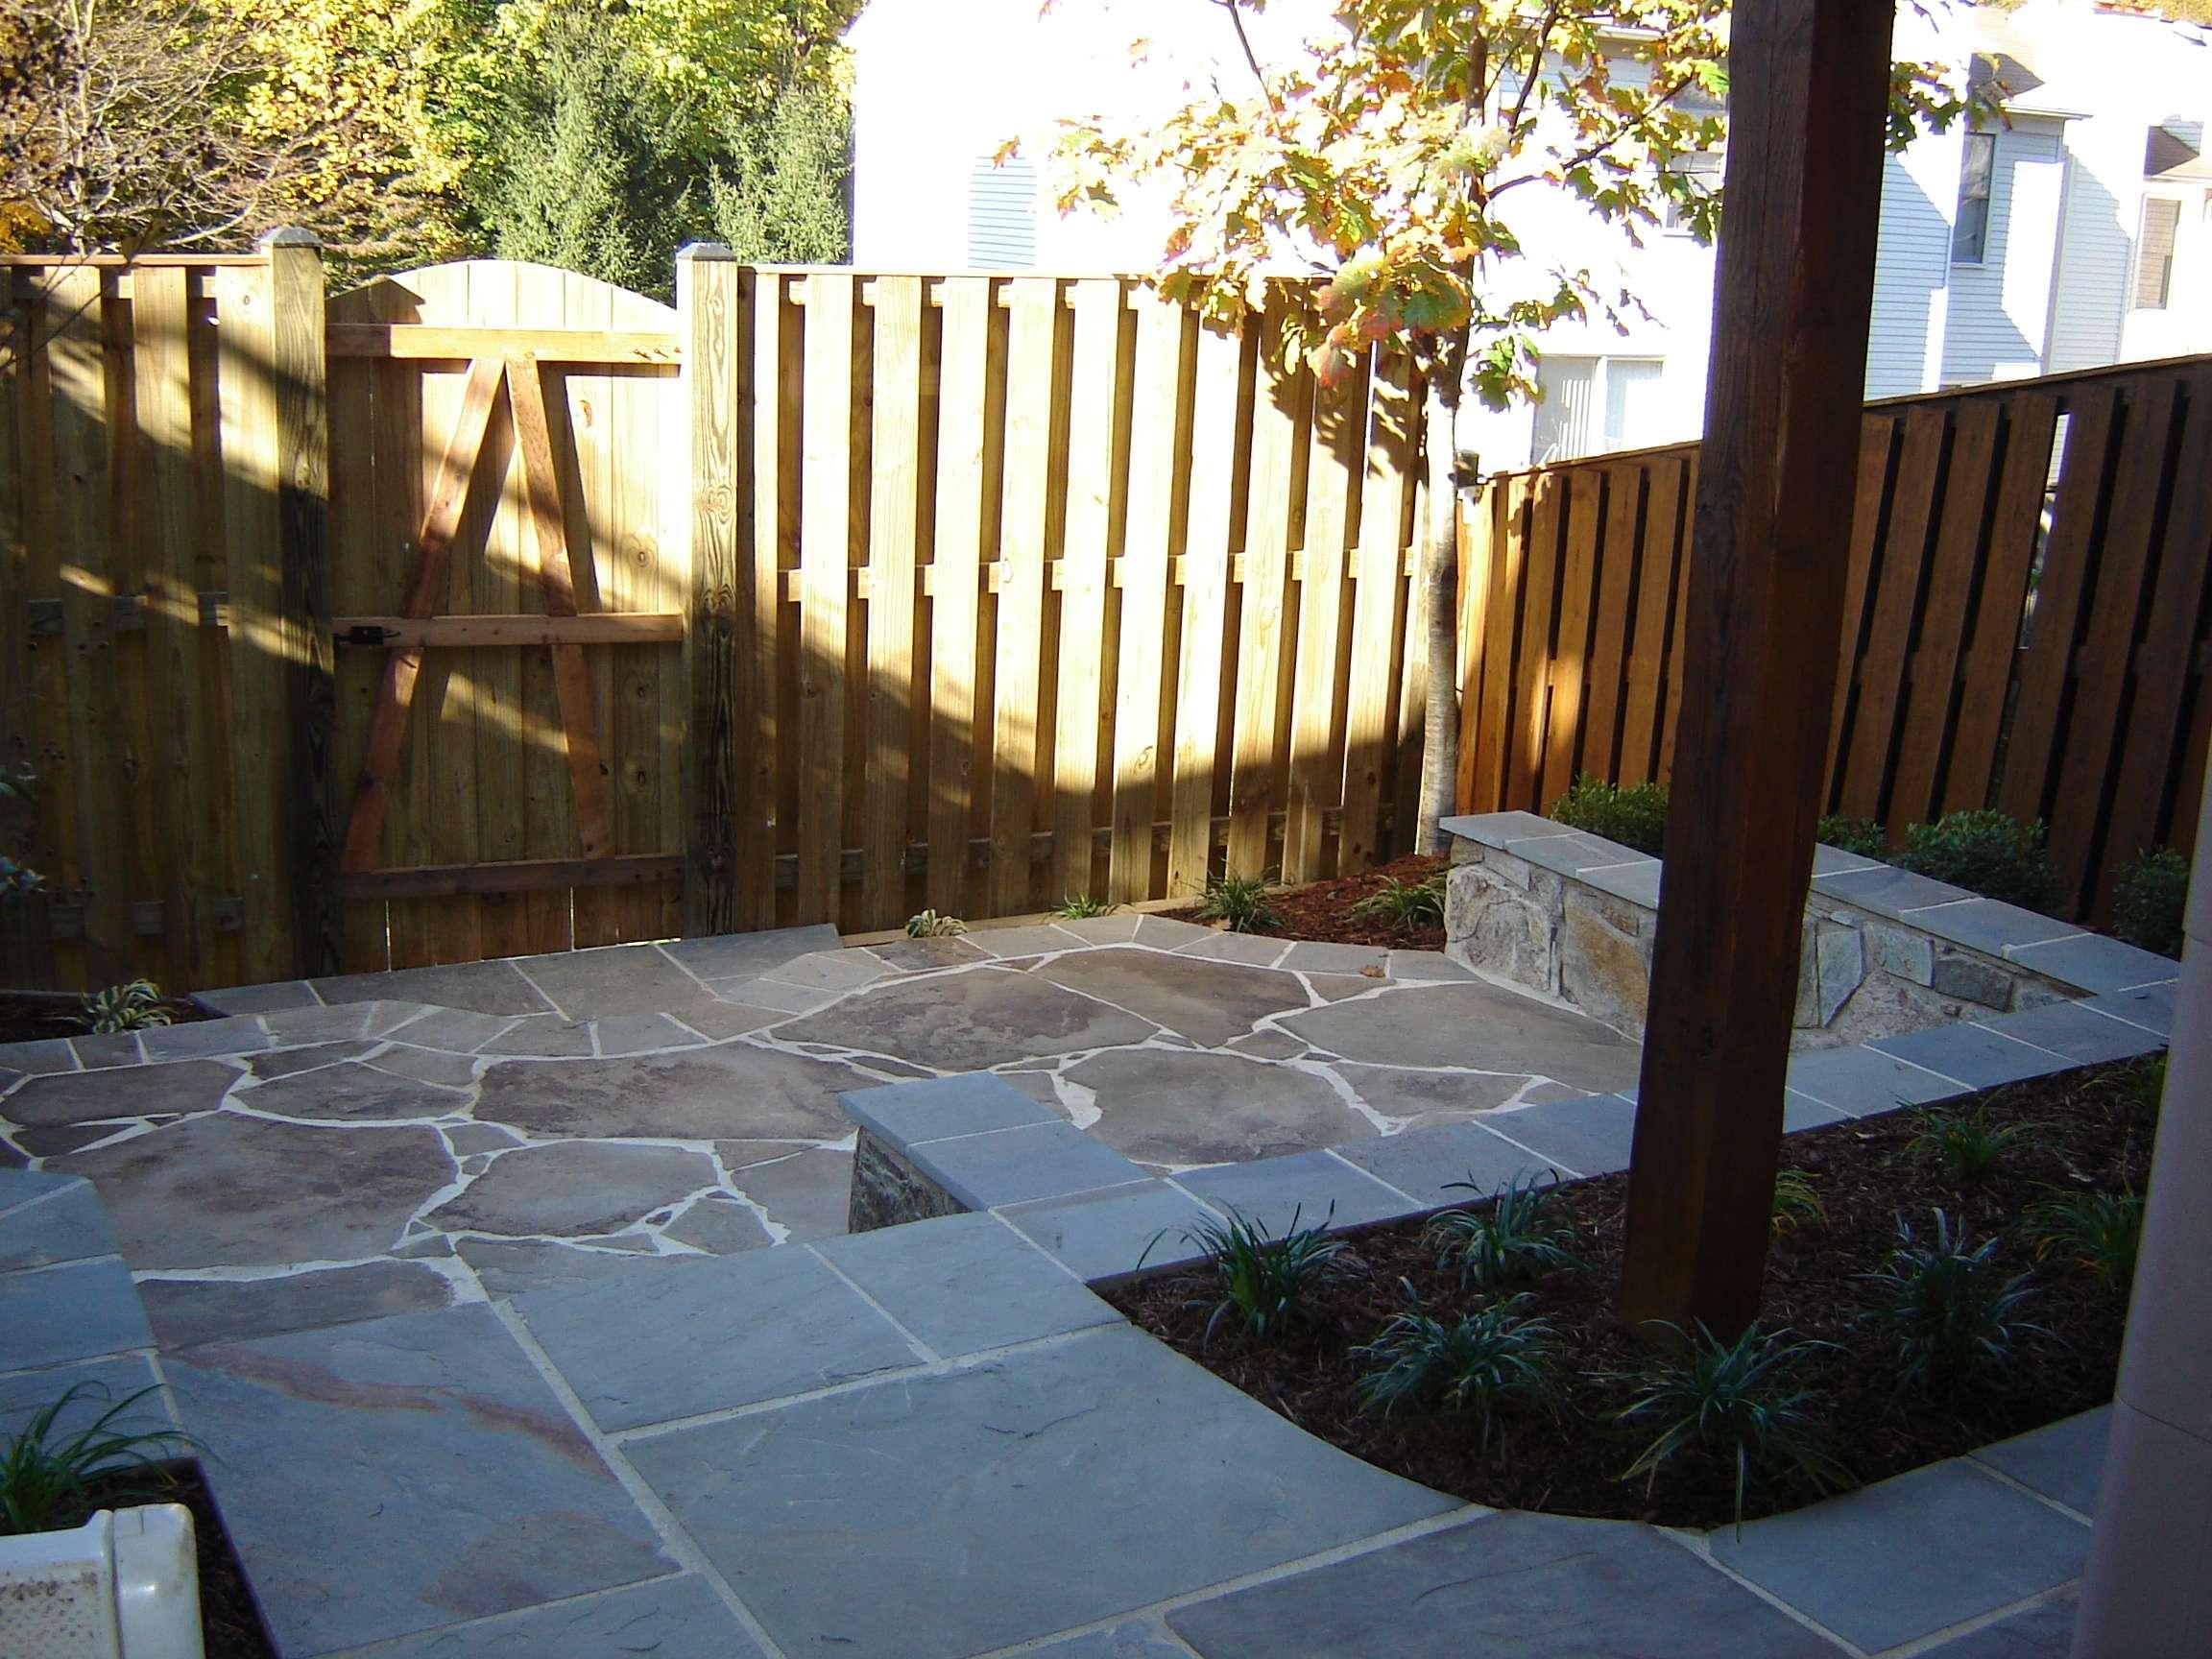 Free flowing patio design